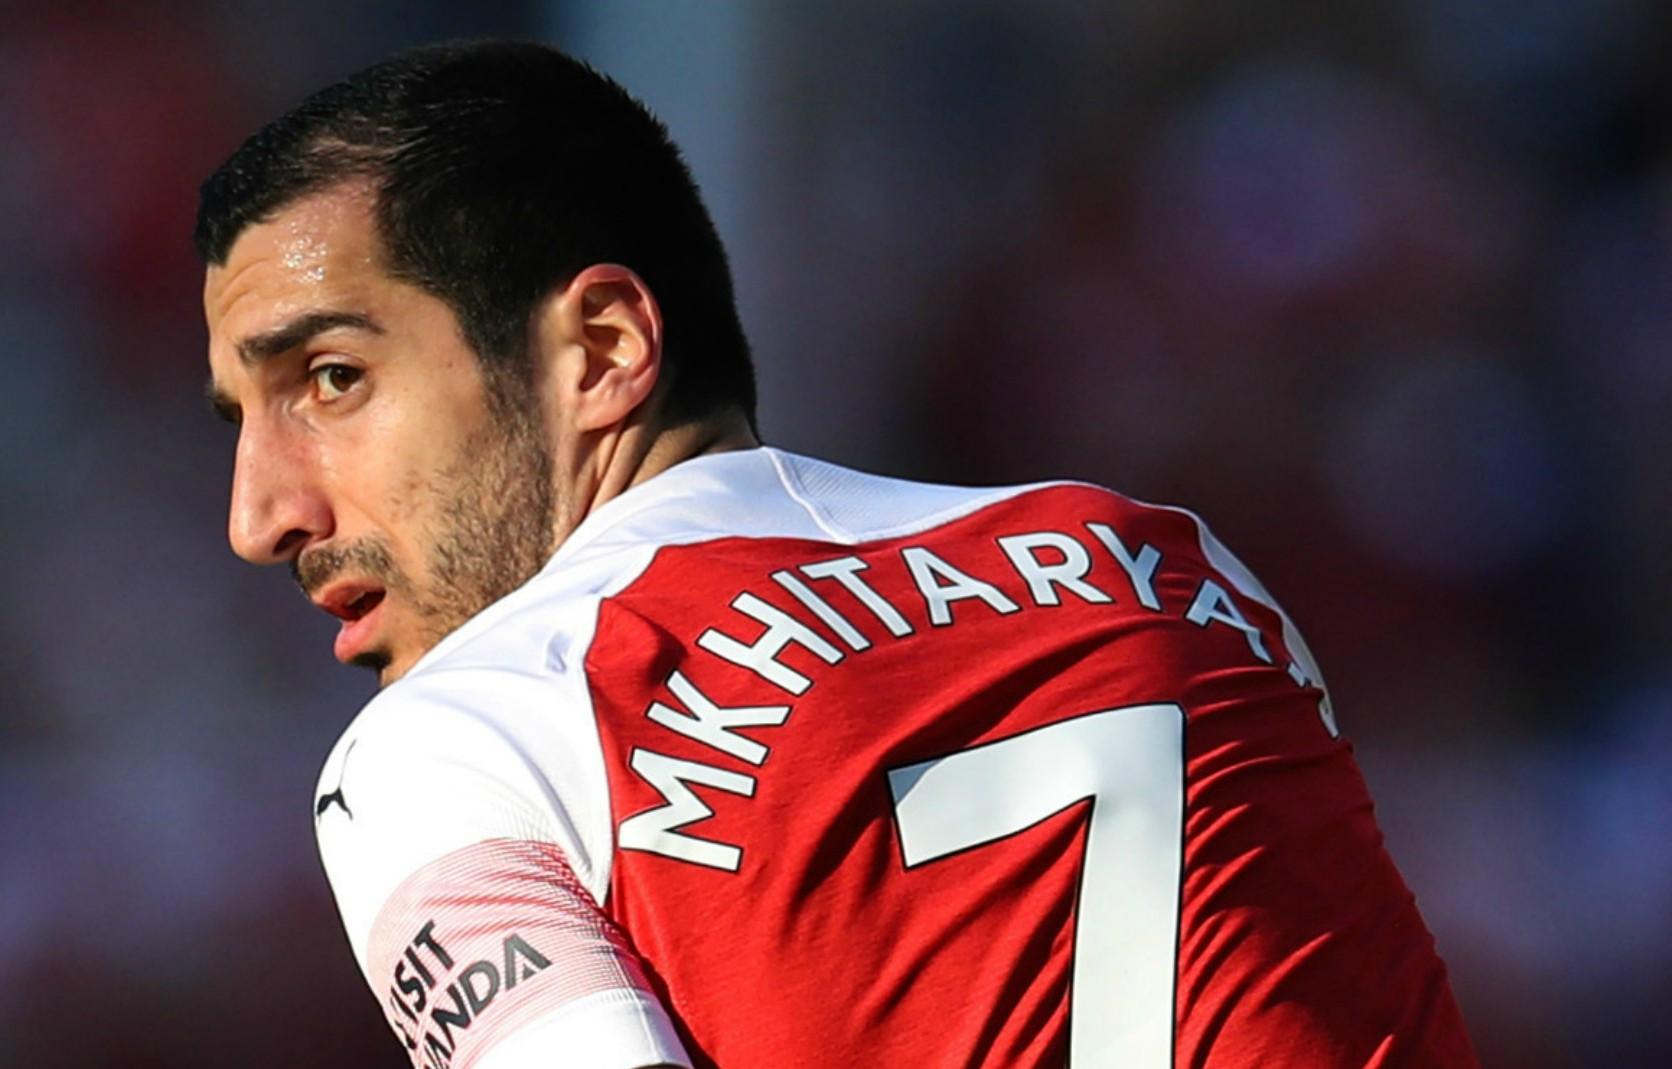 Arsenal news: Mkhitaryan tweet on Man Utd Europa League win